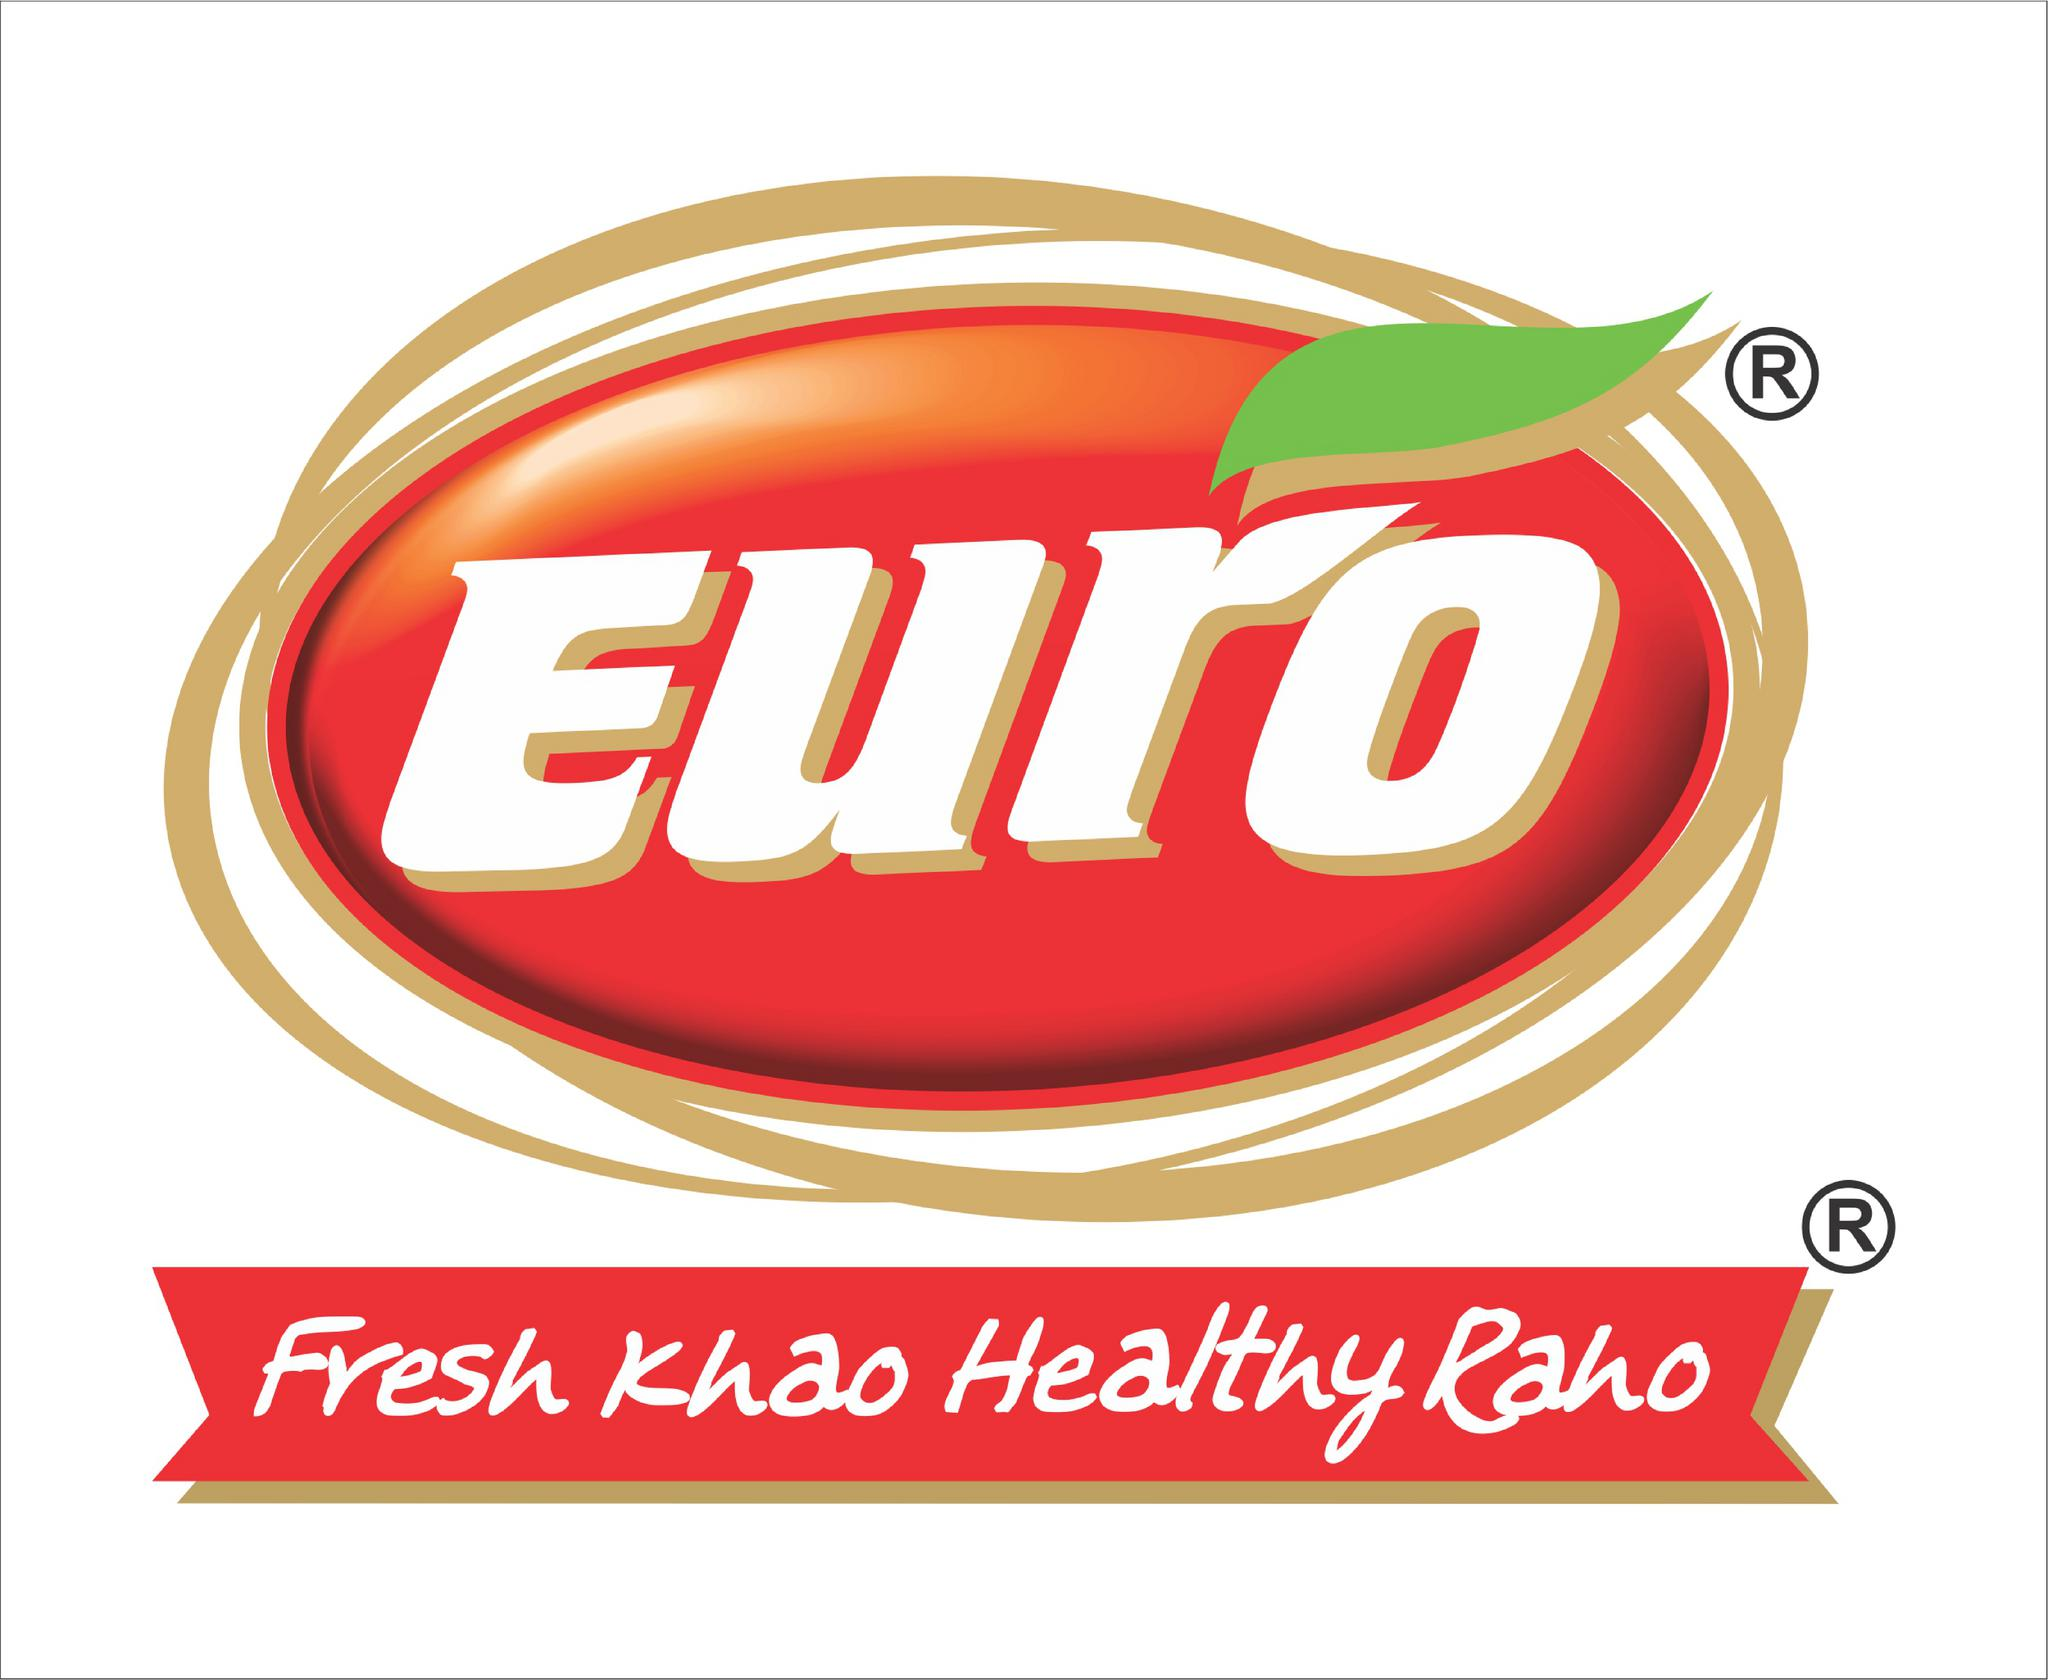 Euro India Fresh Foods Ltd - Gulfood 2019 - World's largest annual